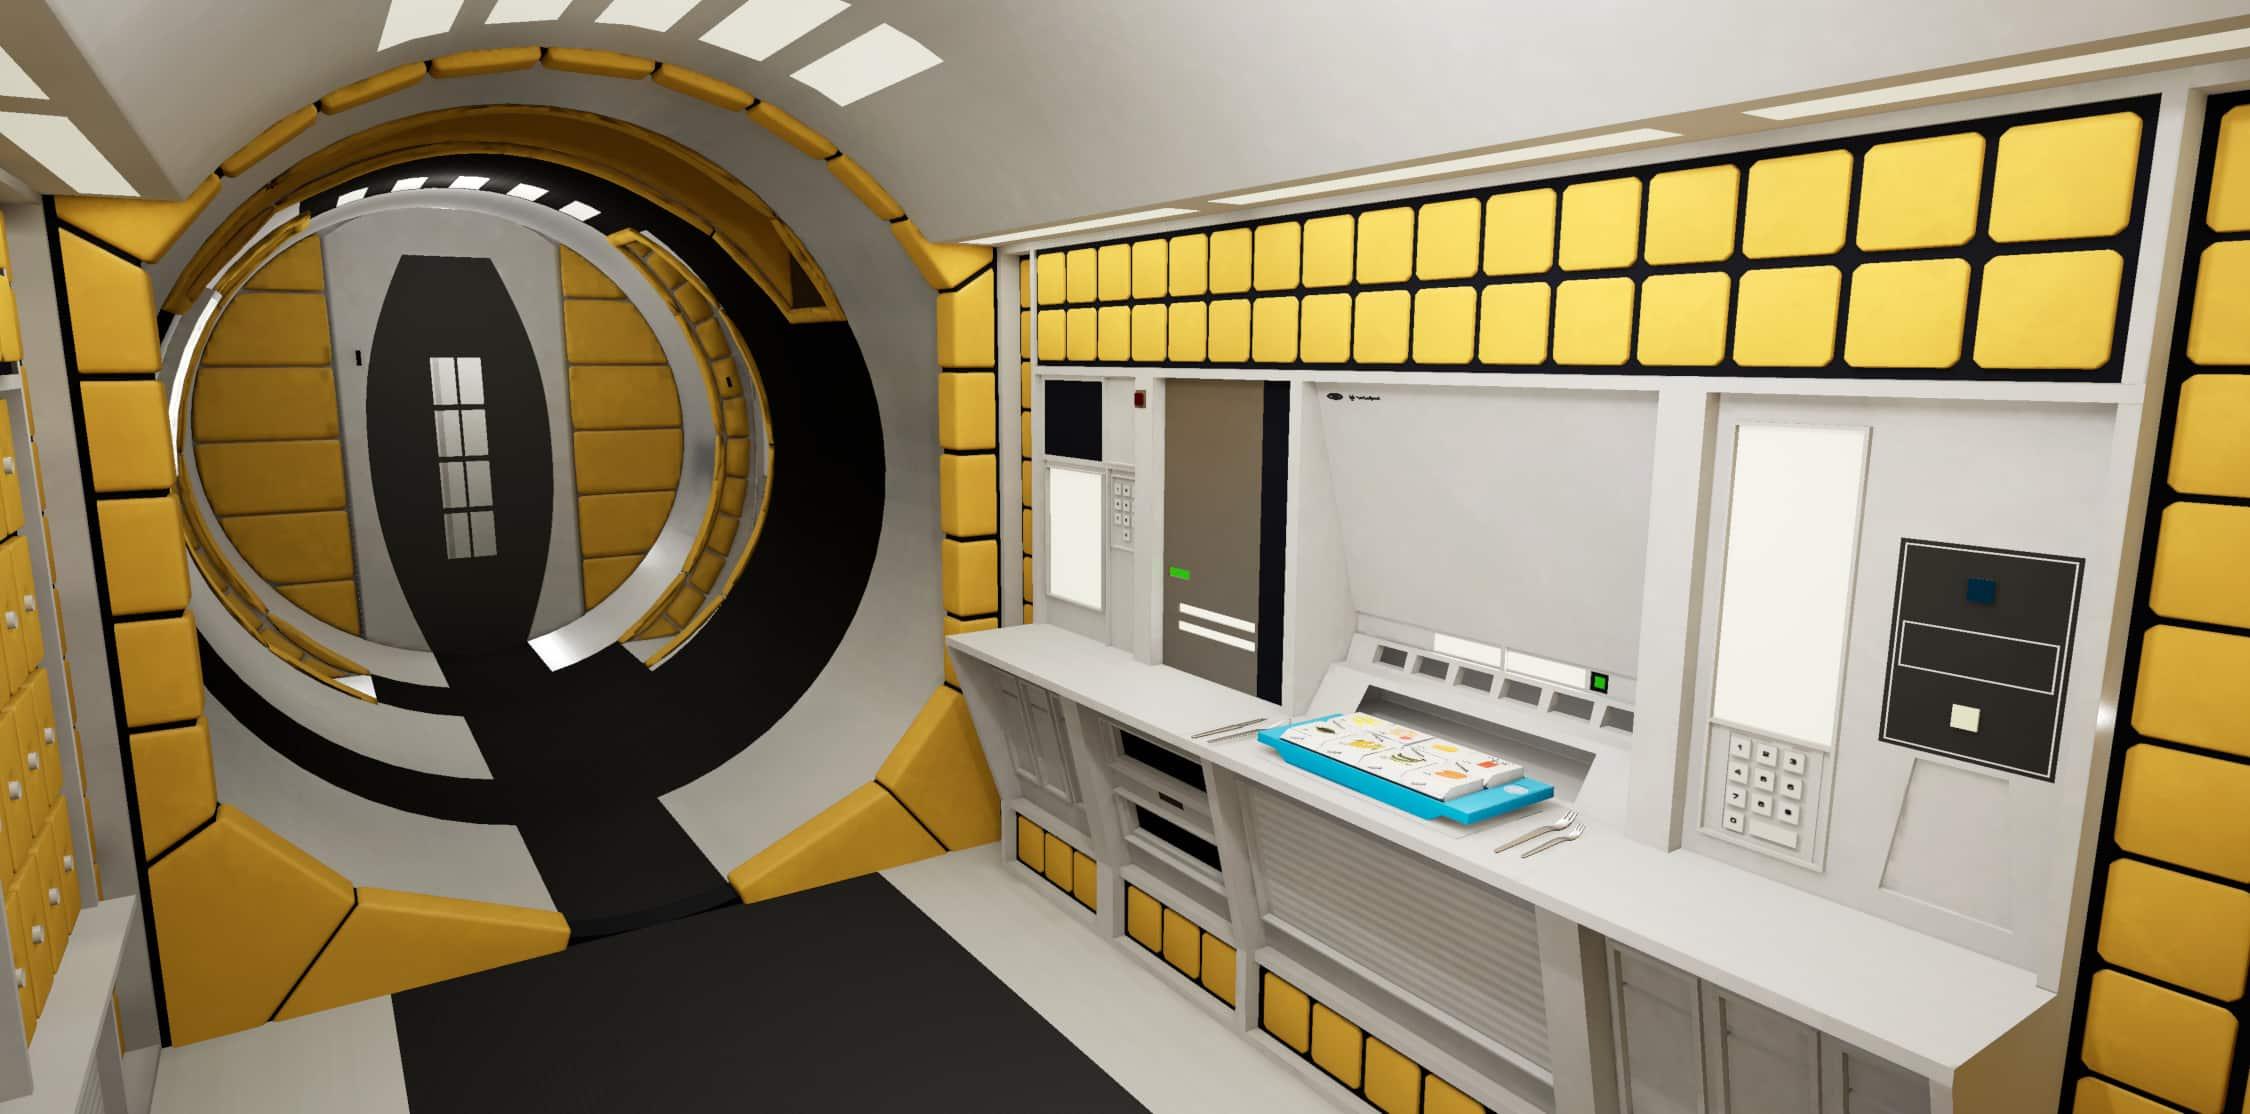 Space_Odyssey_Ximula_1_Original